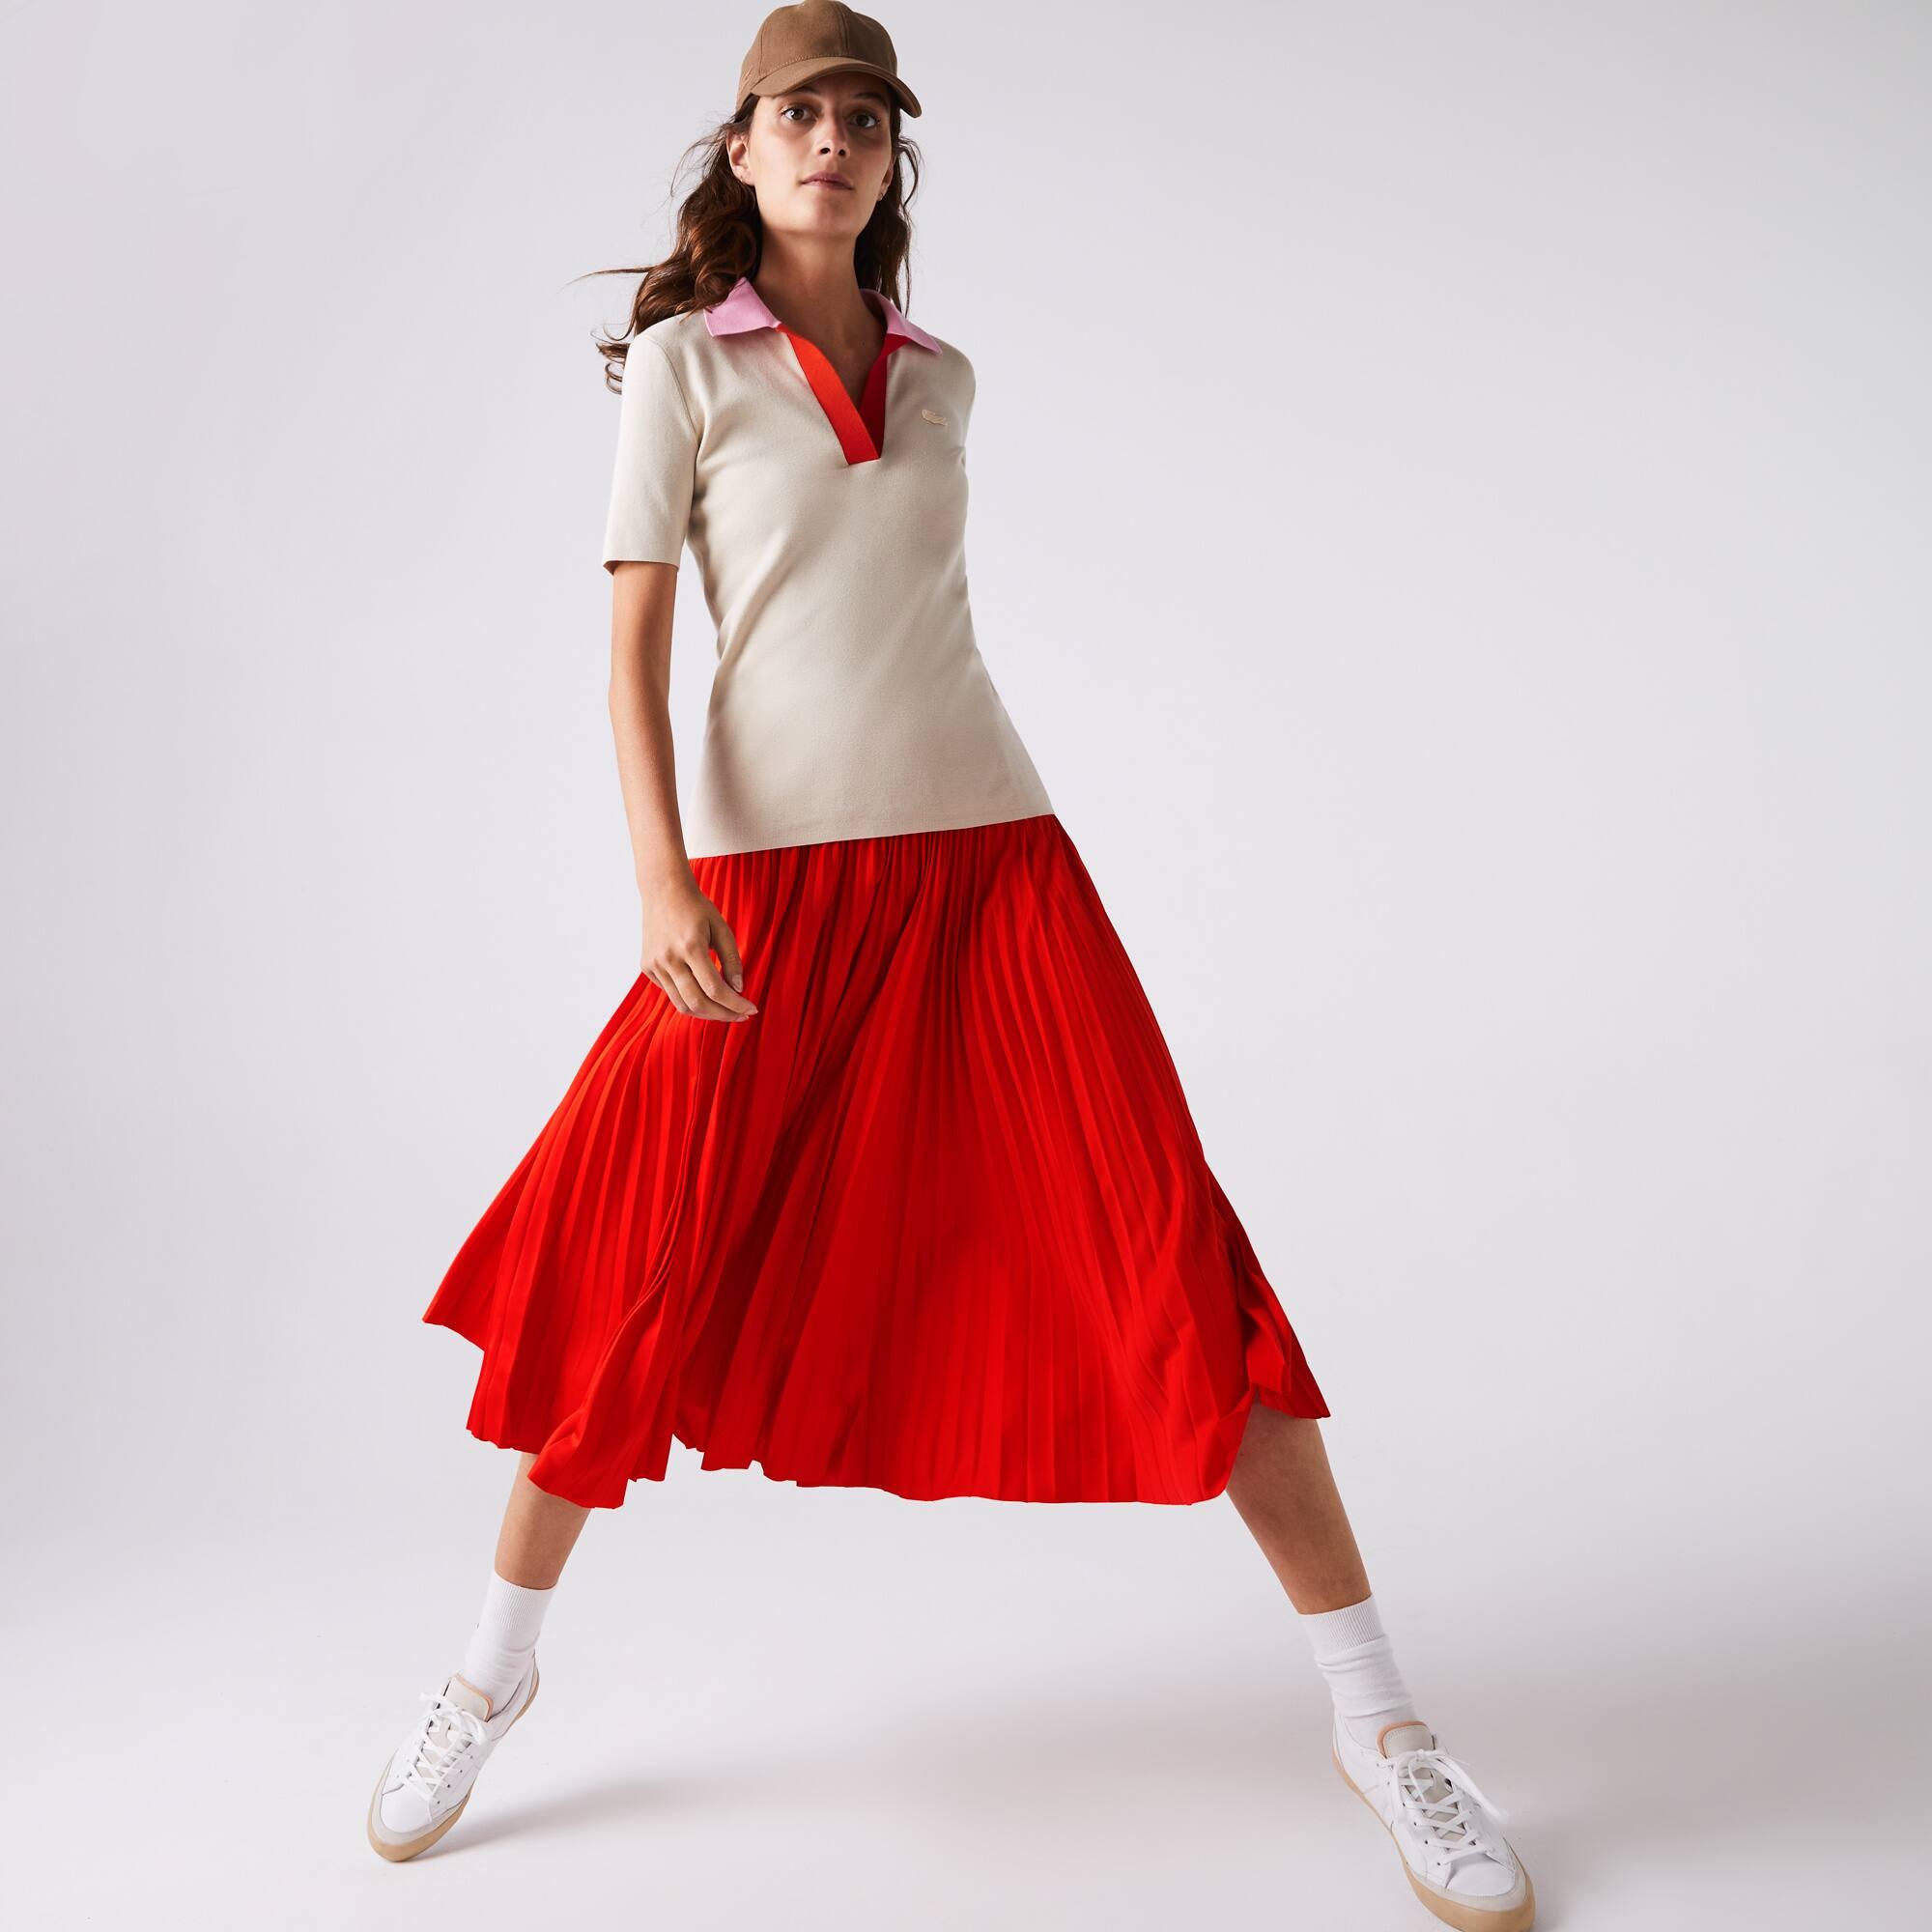 Lacoste Womens Branded Elasticised Pleated Skirt